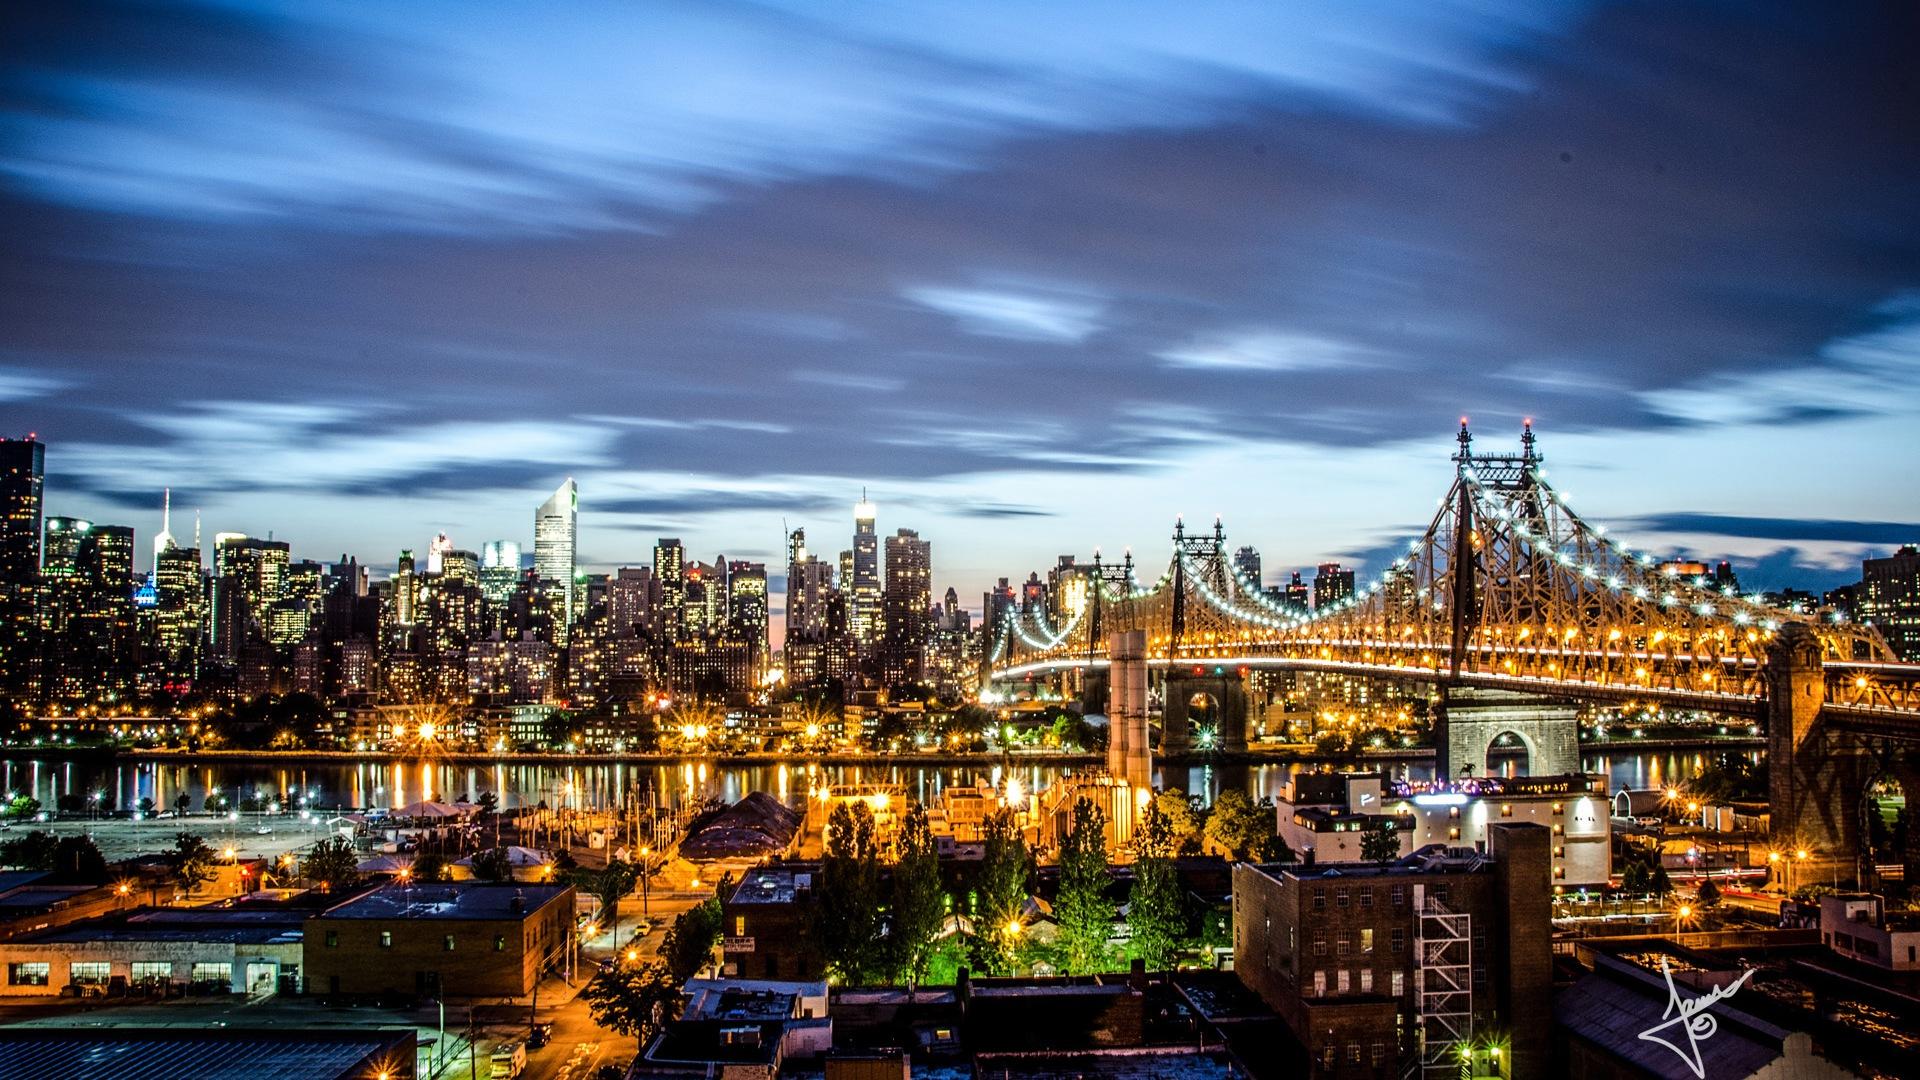 paysages urbains de new york microsoft windows 8 fonds d 39 cran hd 3 1920x1080 fond d 39 cran. Black Bedroom Furniture Sets. Home Design Ideas